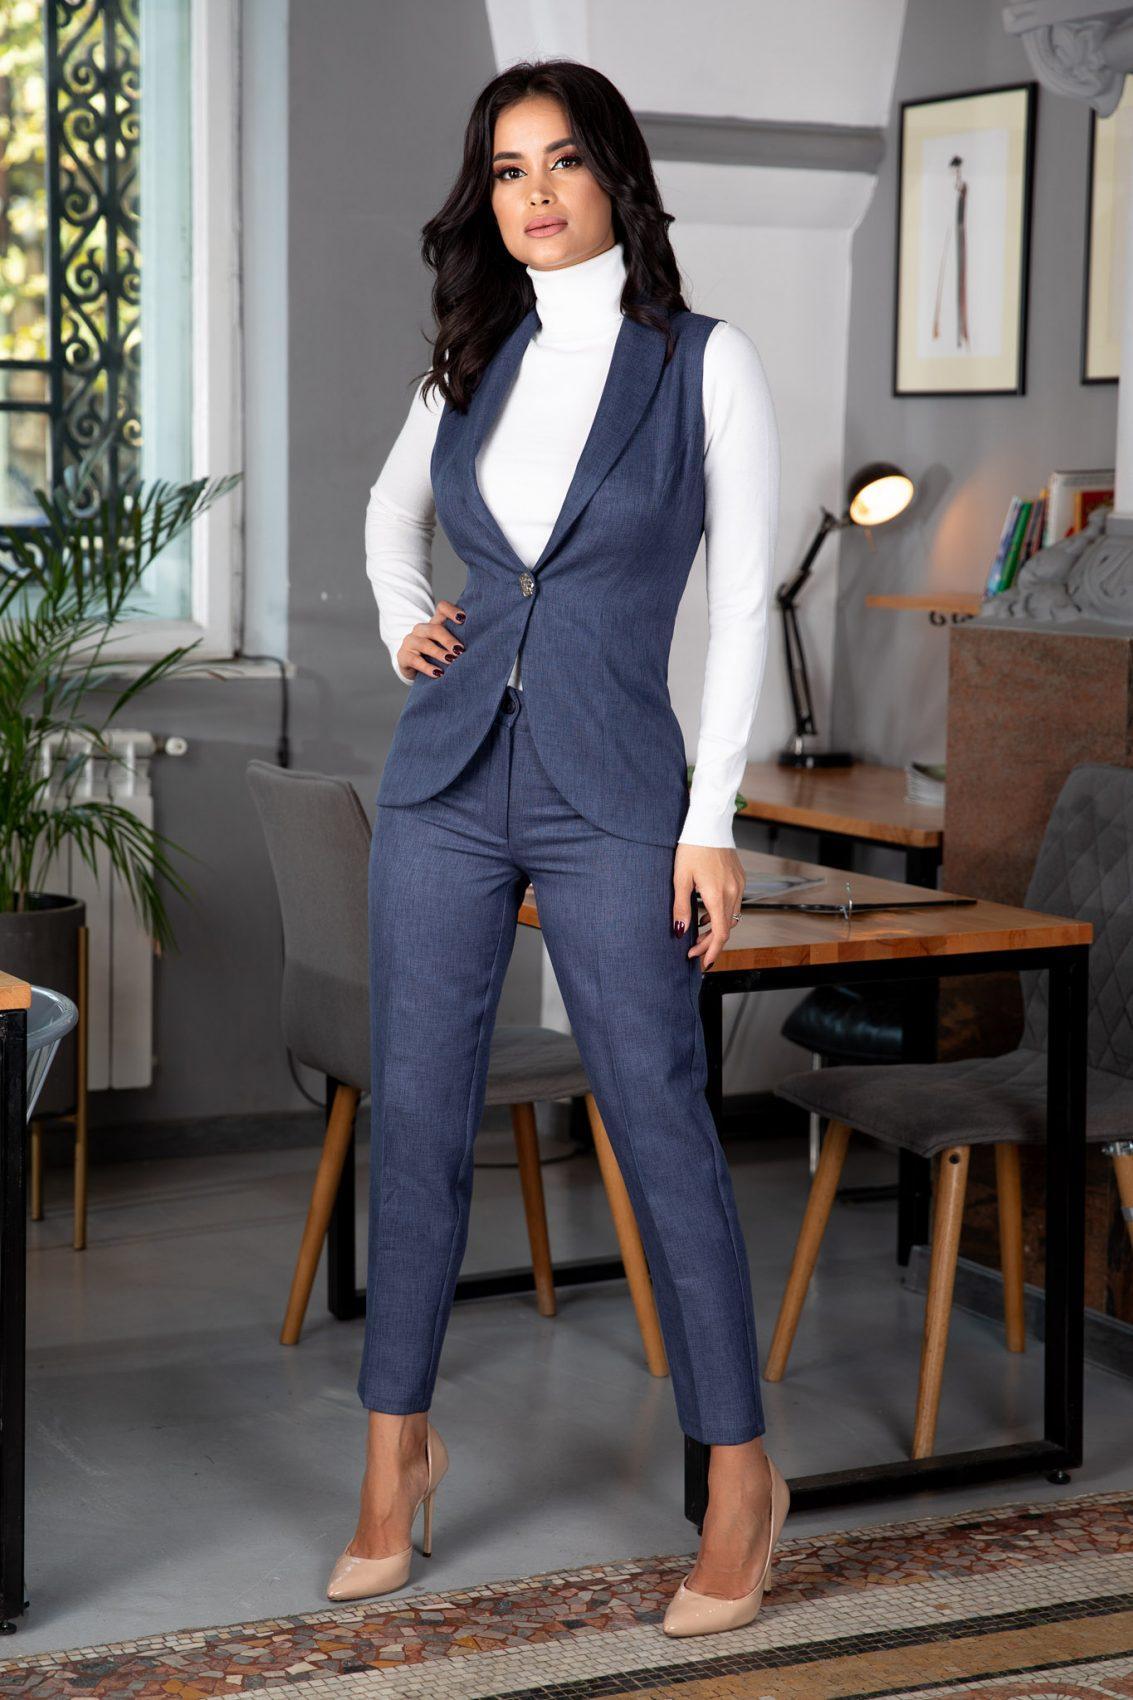 Terry Navy Blue Suit